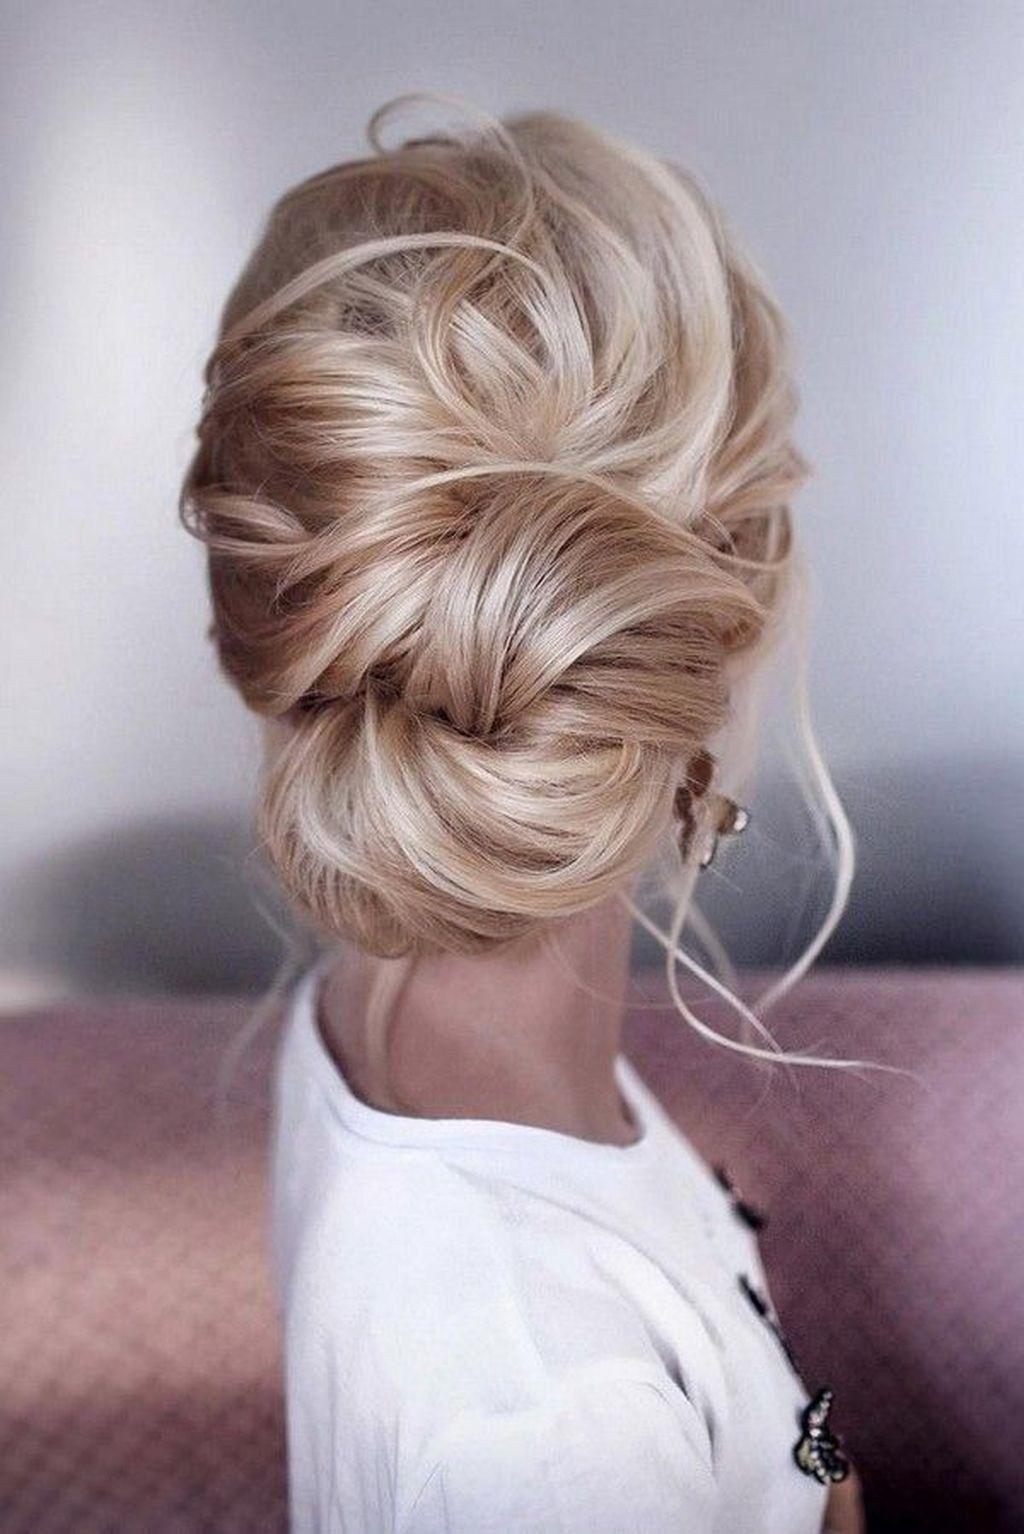 37 delightful wedding hairstyles ideas   wedding ideas